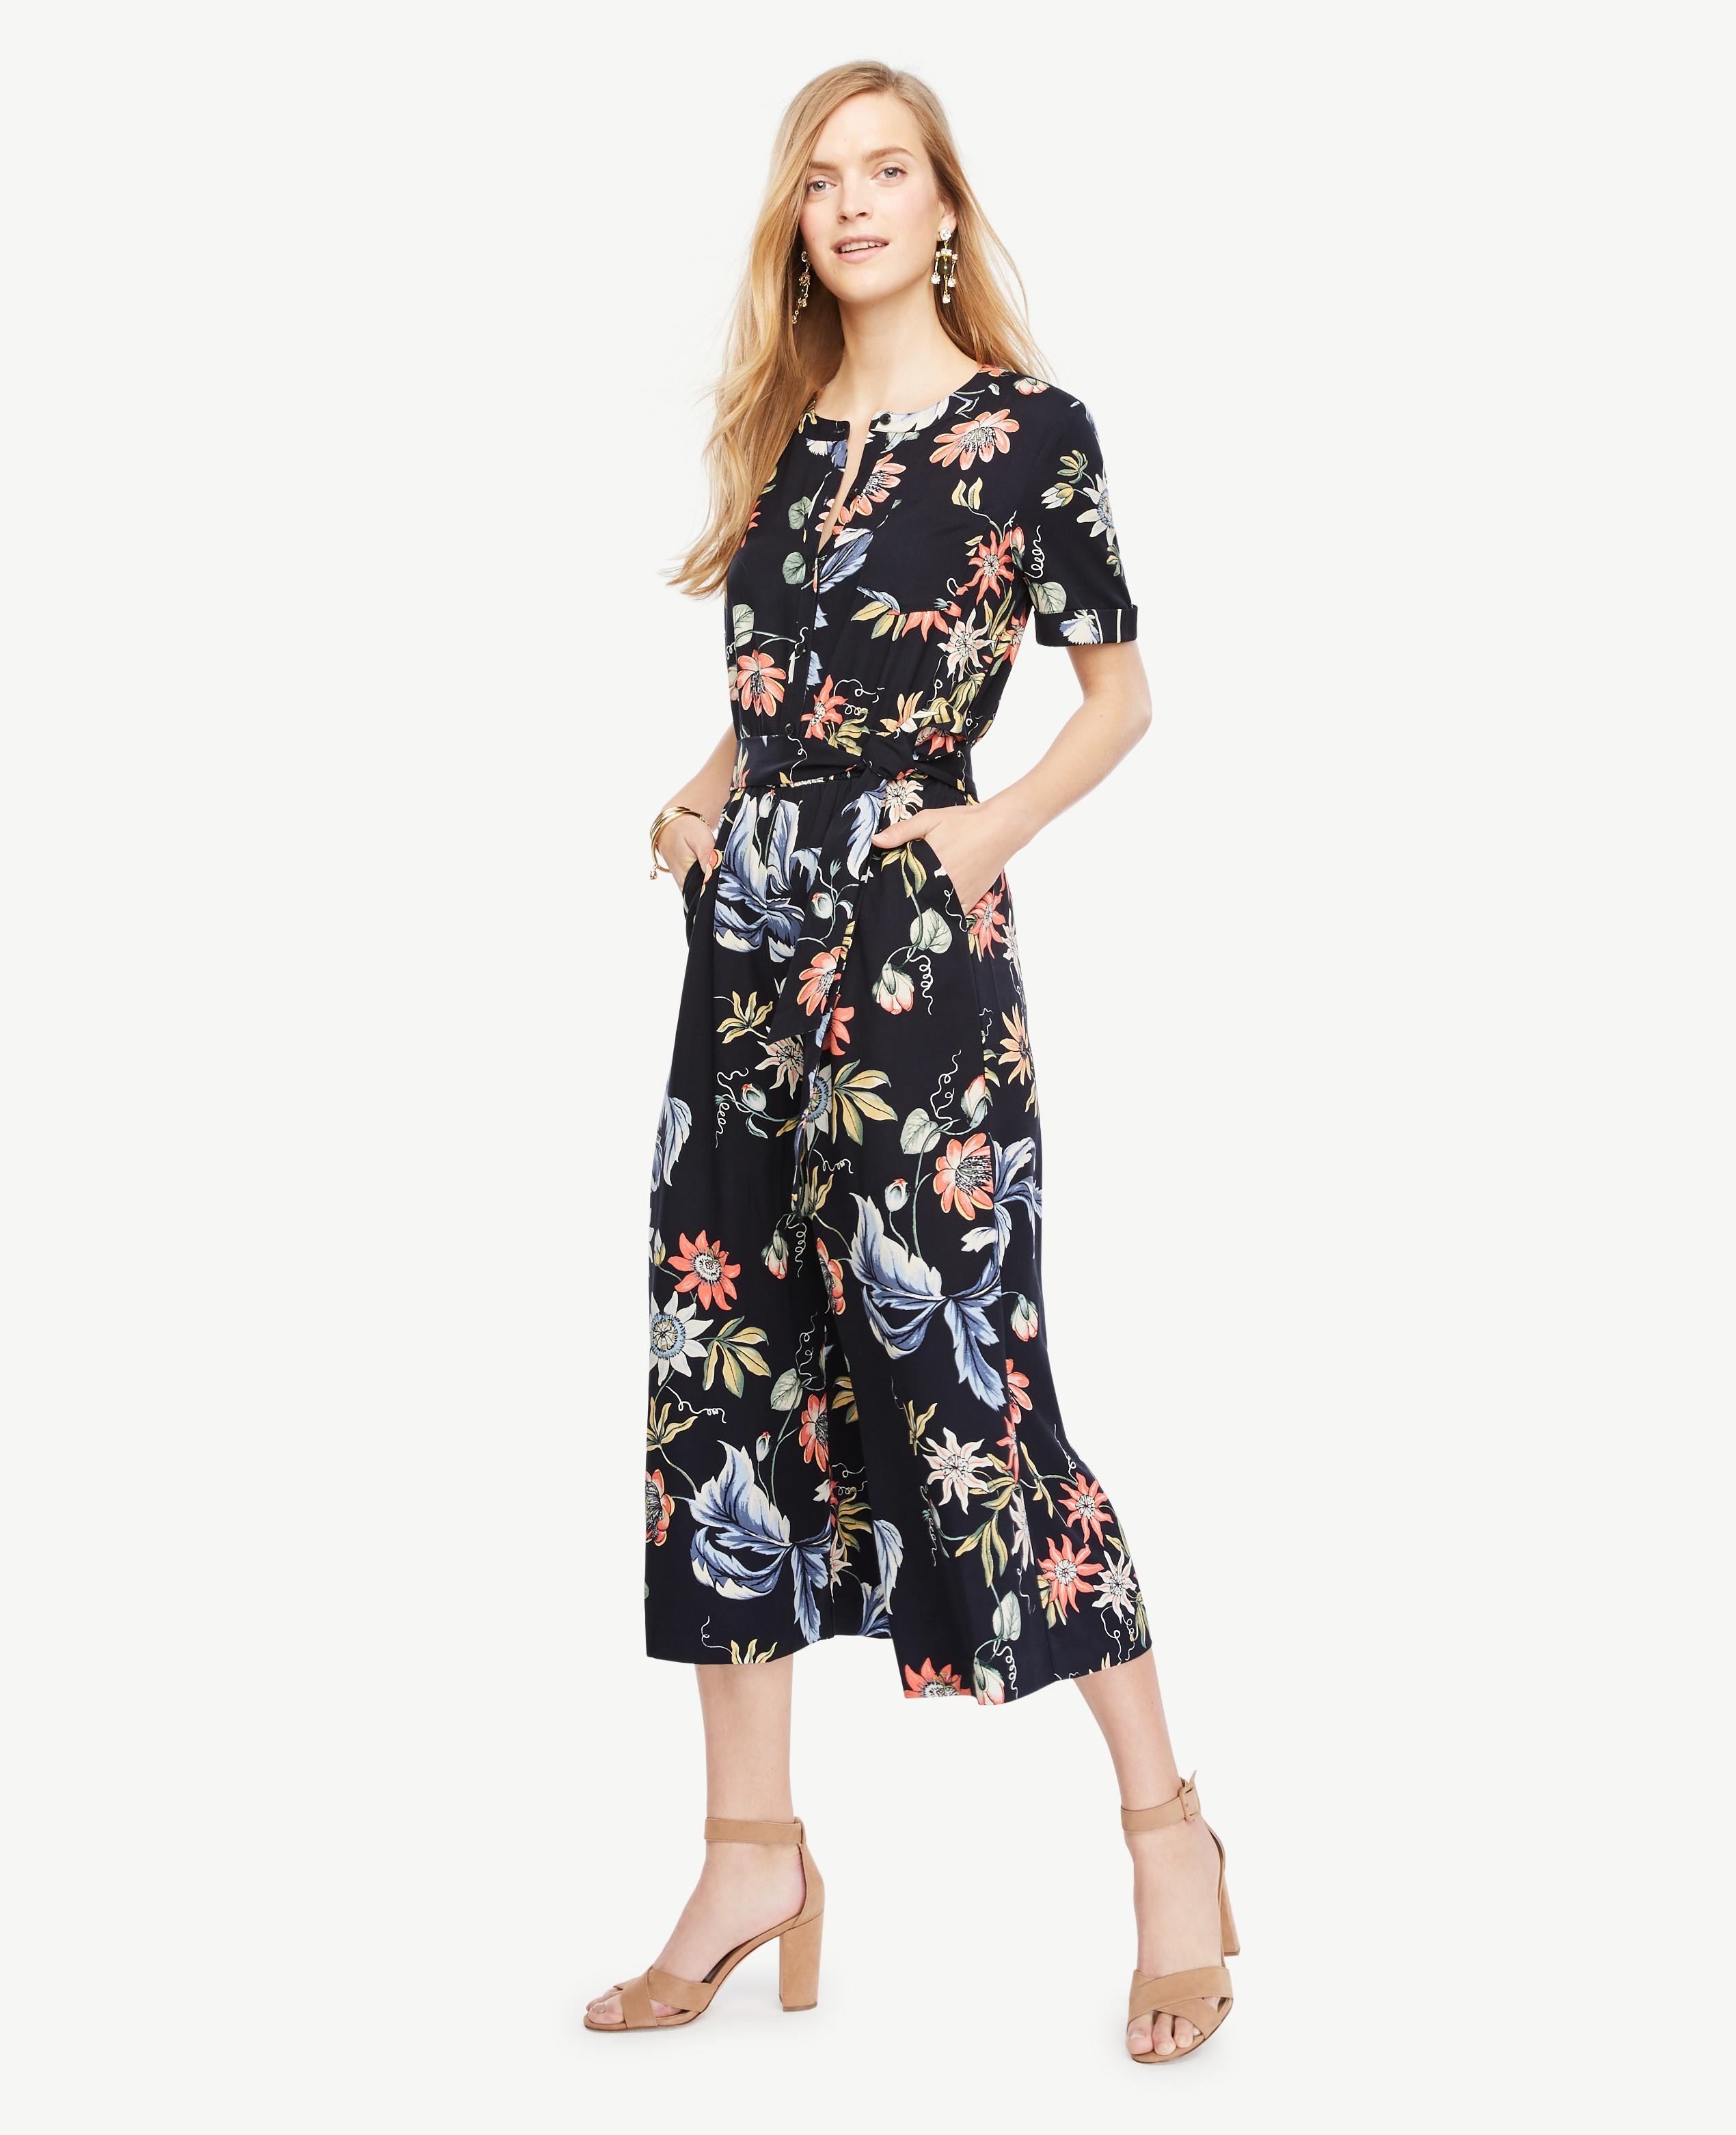 ad7debe777da Lyst - Ann Taylor Tall Wild Flower Culotte Jumpsuit in Blue